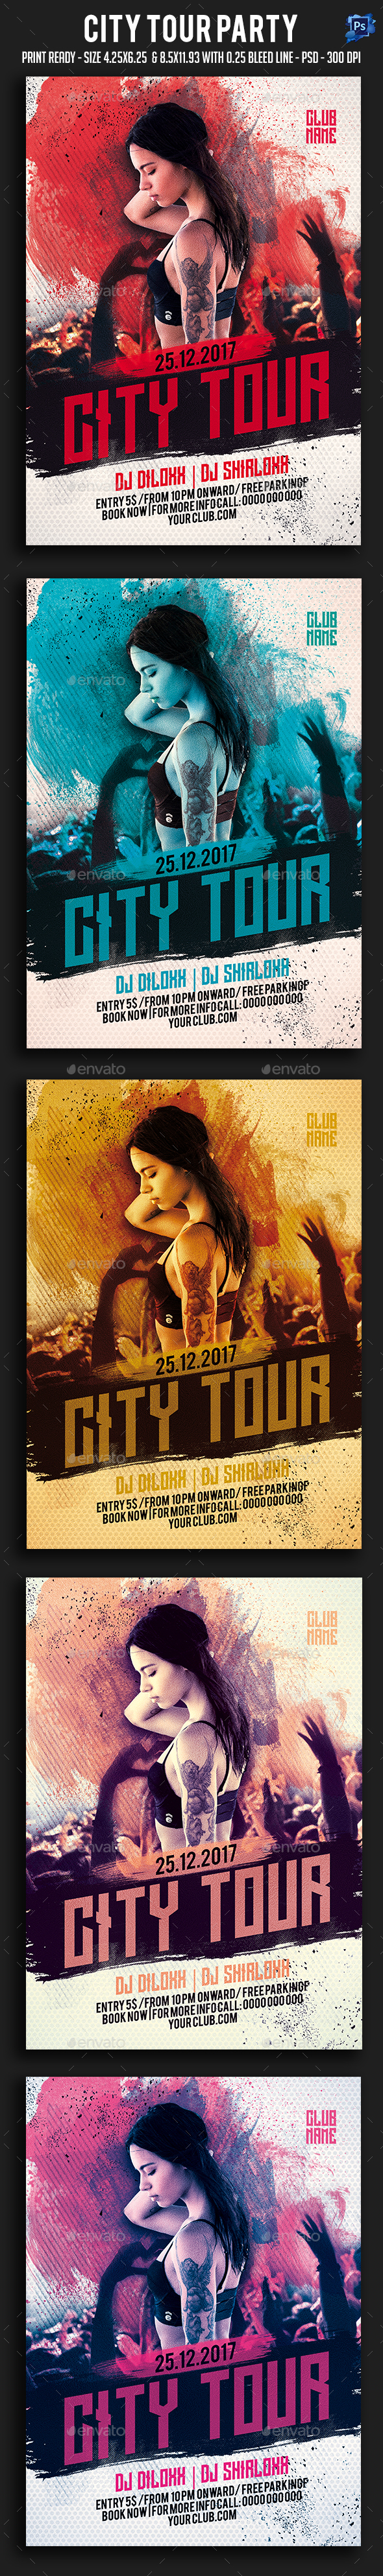 City Tour Party Flyer - Clubs & Parties Events